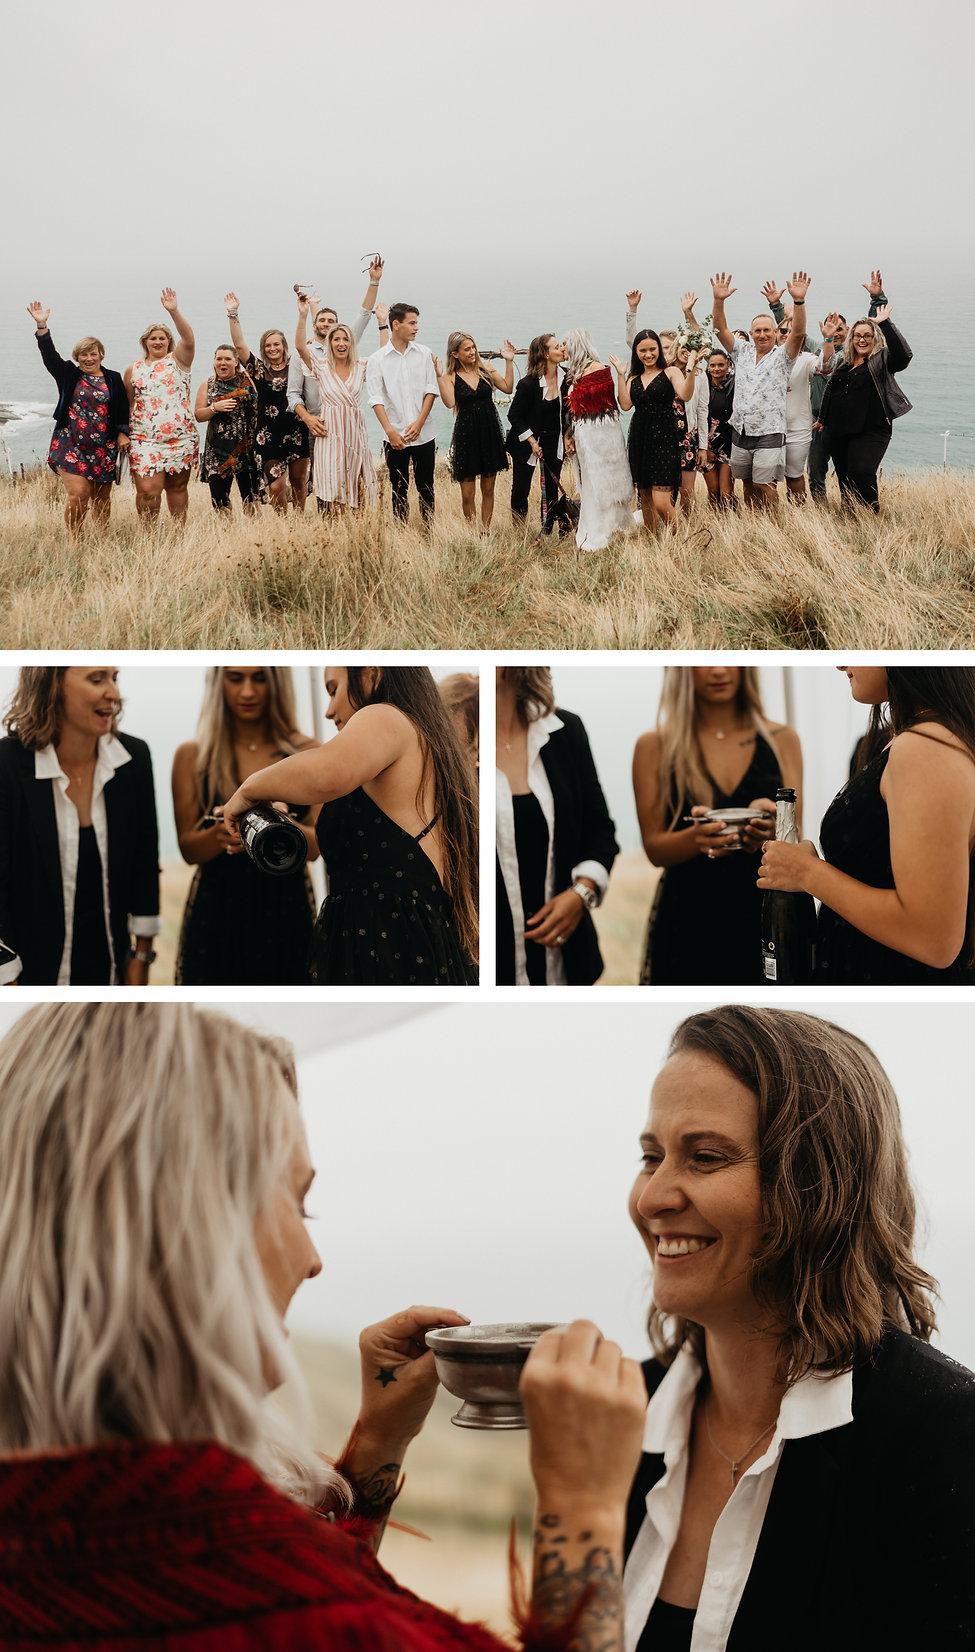 intimate lesbian wedding captured by wanderlusting lovers, mahia, east cape of new zealand, viking wedding tradition